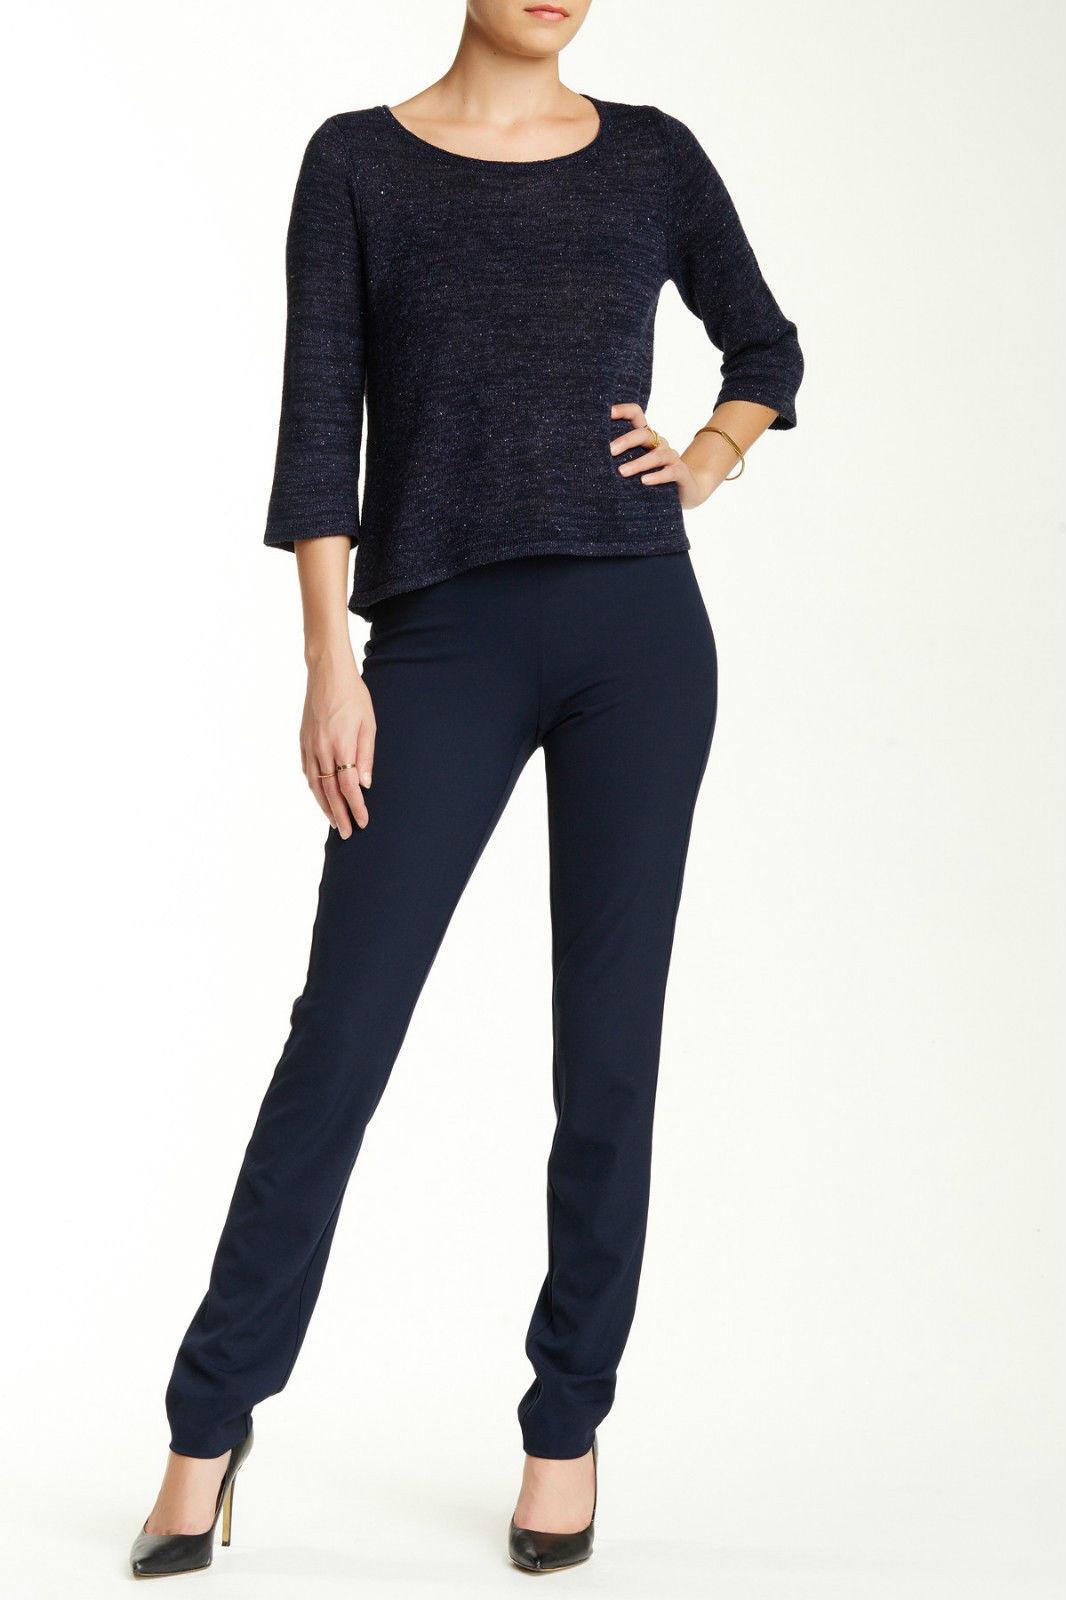 SZ 10 Eileen Fisher Evening bluee Wool Blend Side Zip Slim Pants  248